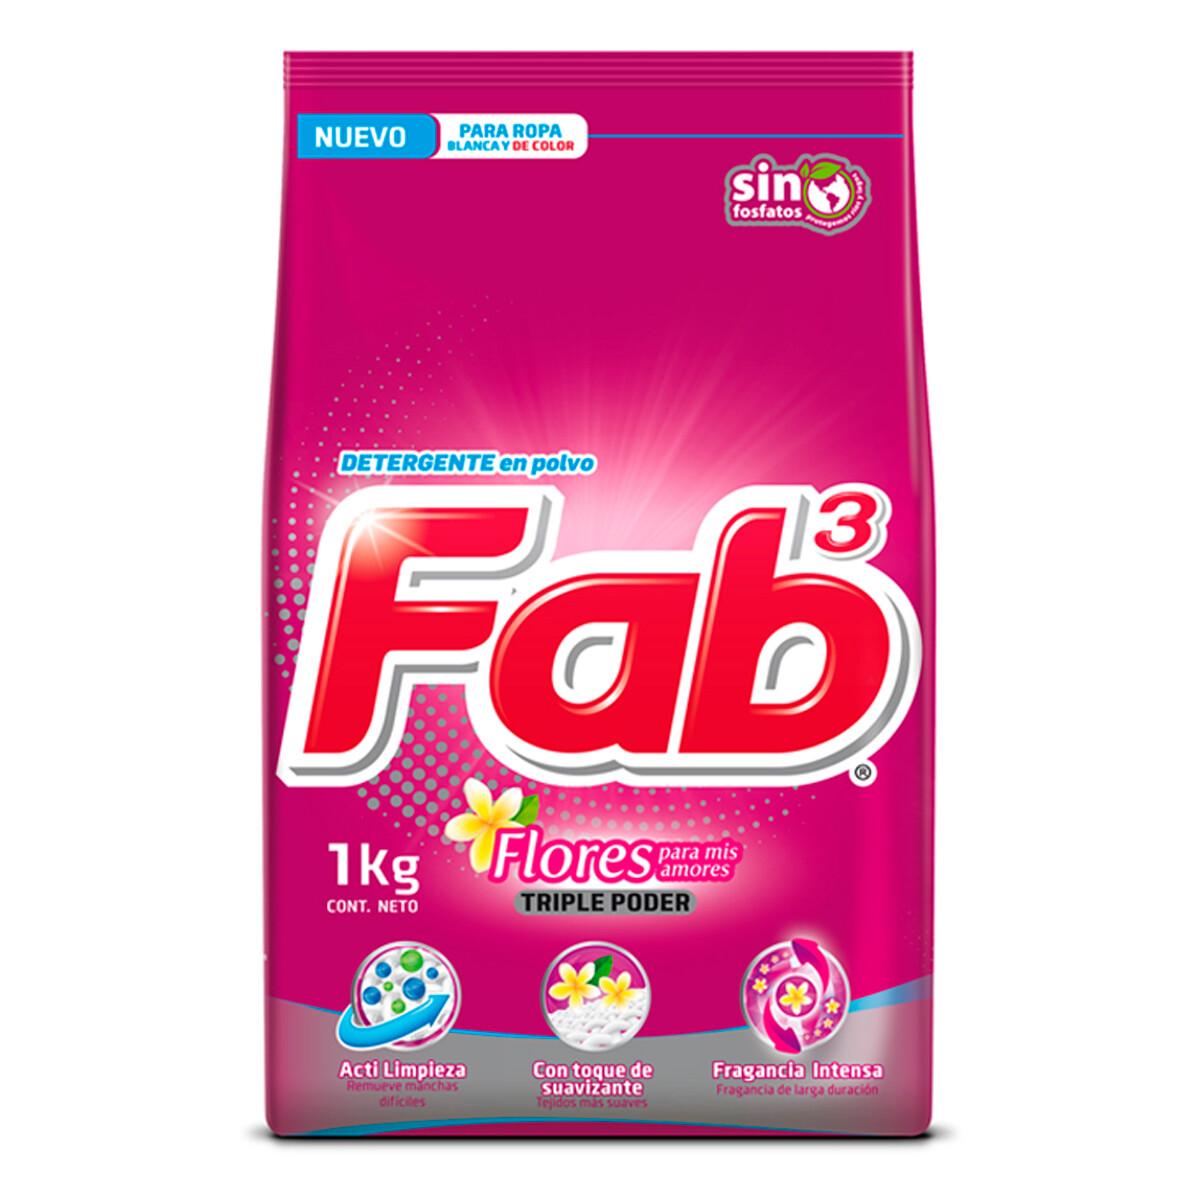 Detergente En Polvo Fab3 Flores Para Mis Amores 1kg